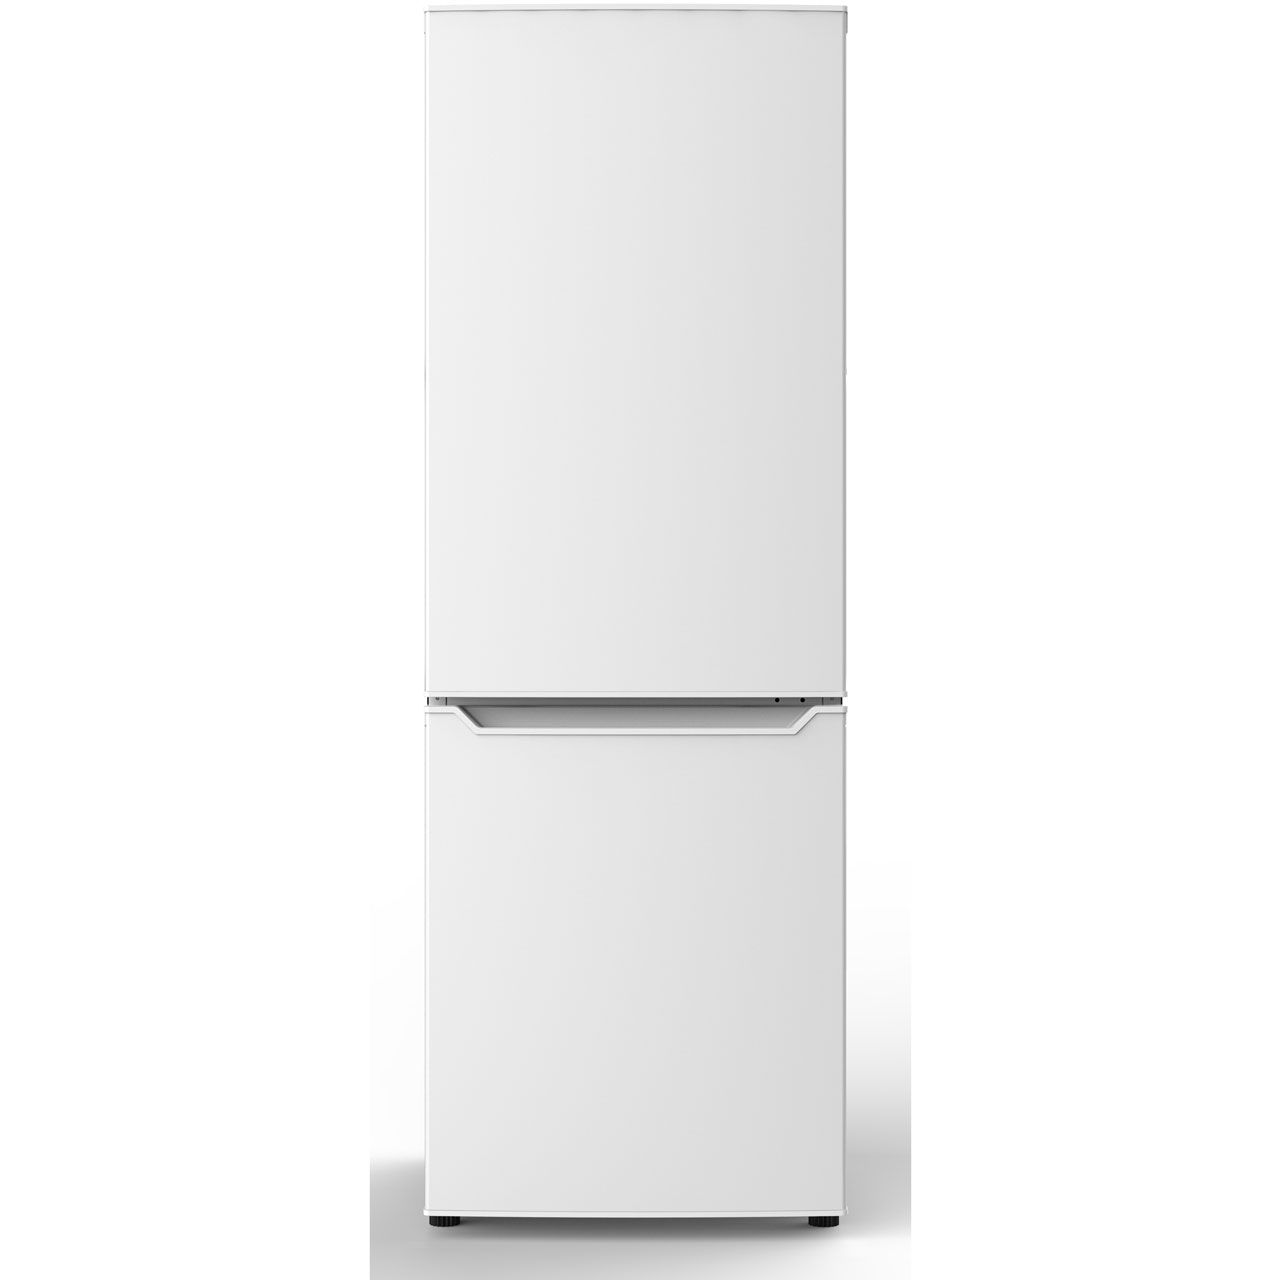 50cm Wide 143cm High 50 Wide Fridge Freezer